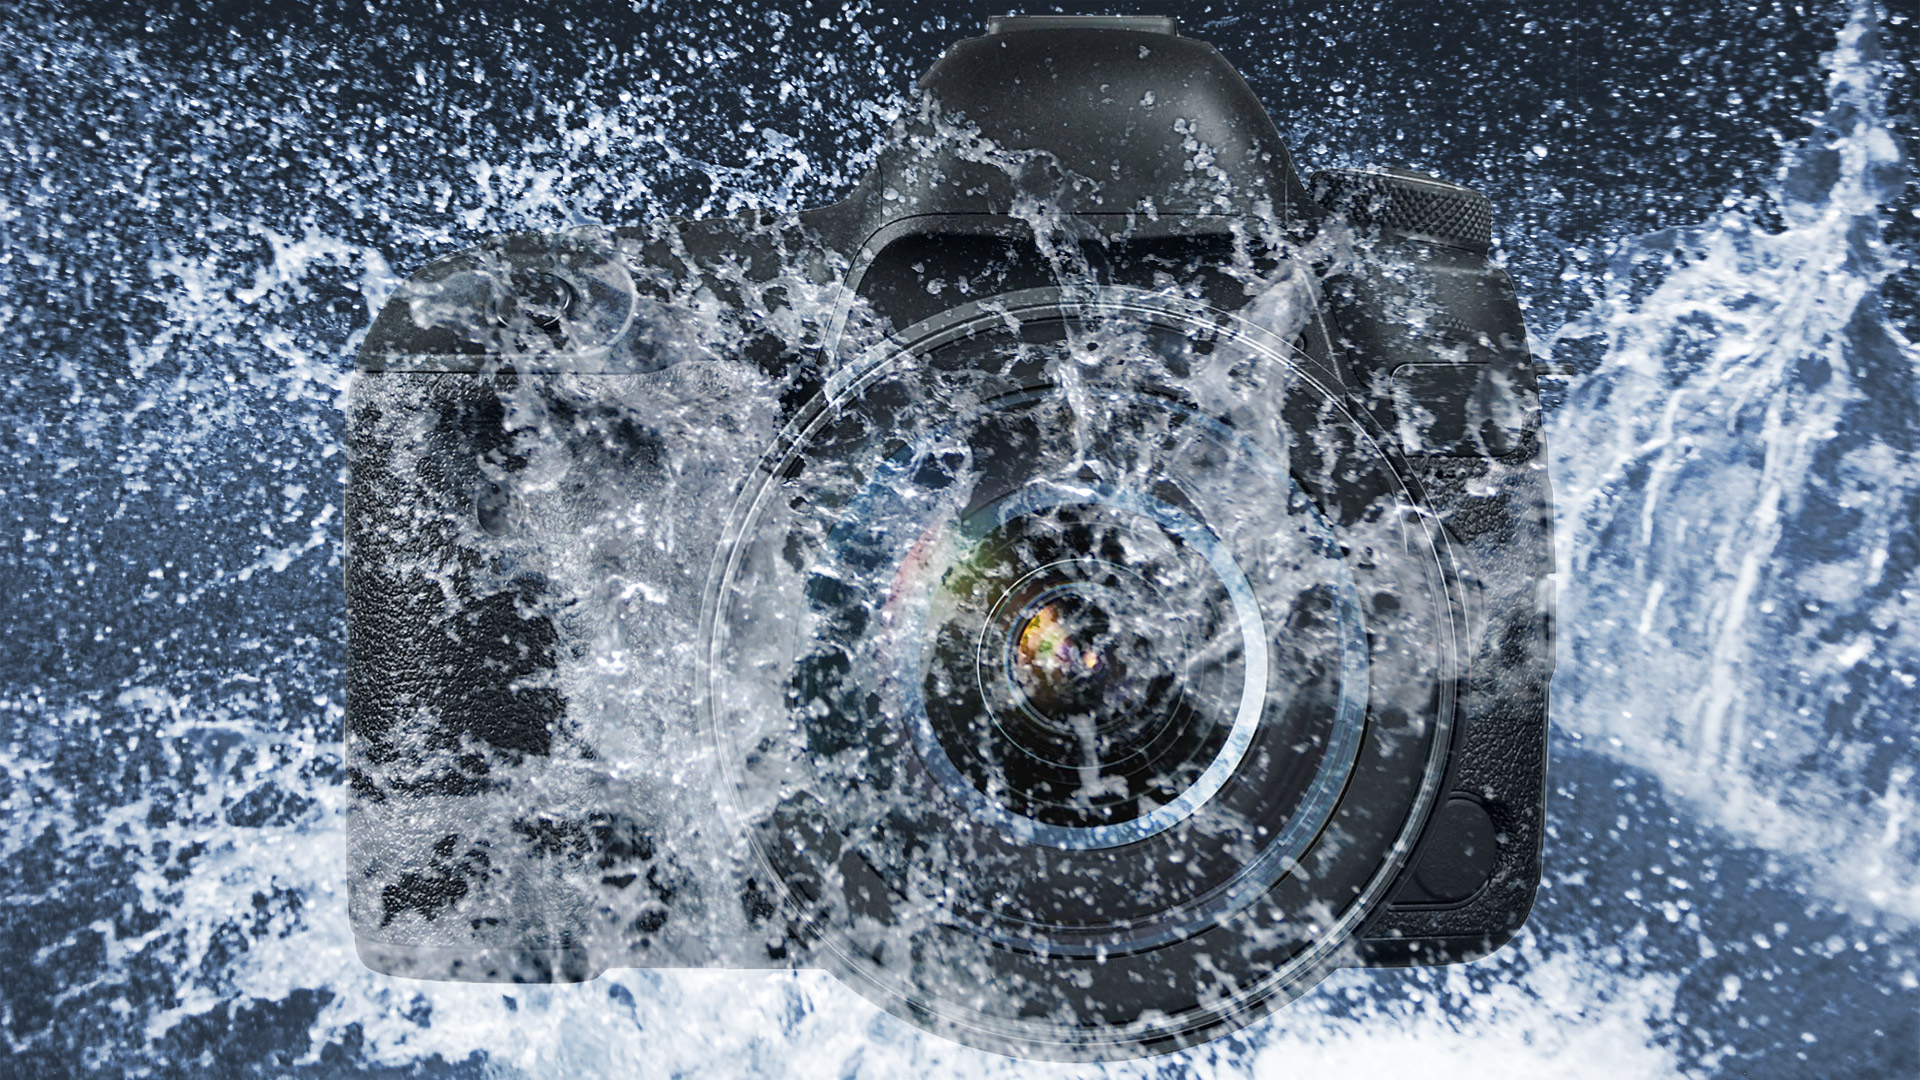 FEATURED-jhahn-wet-camera